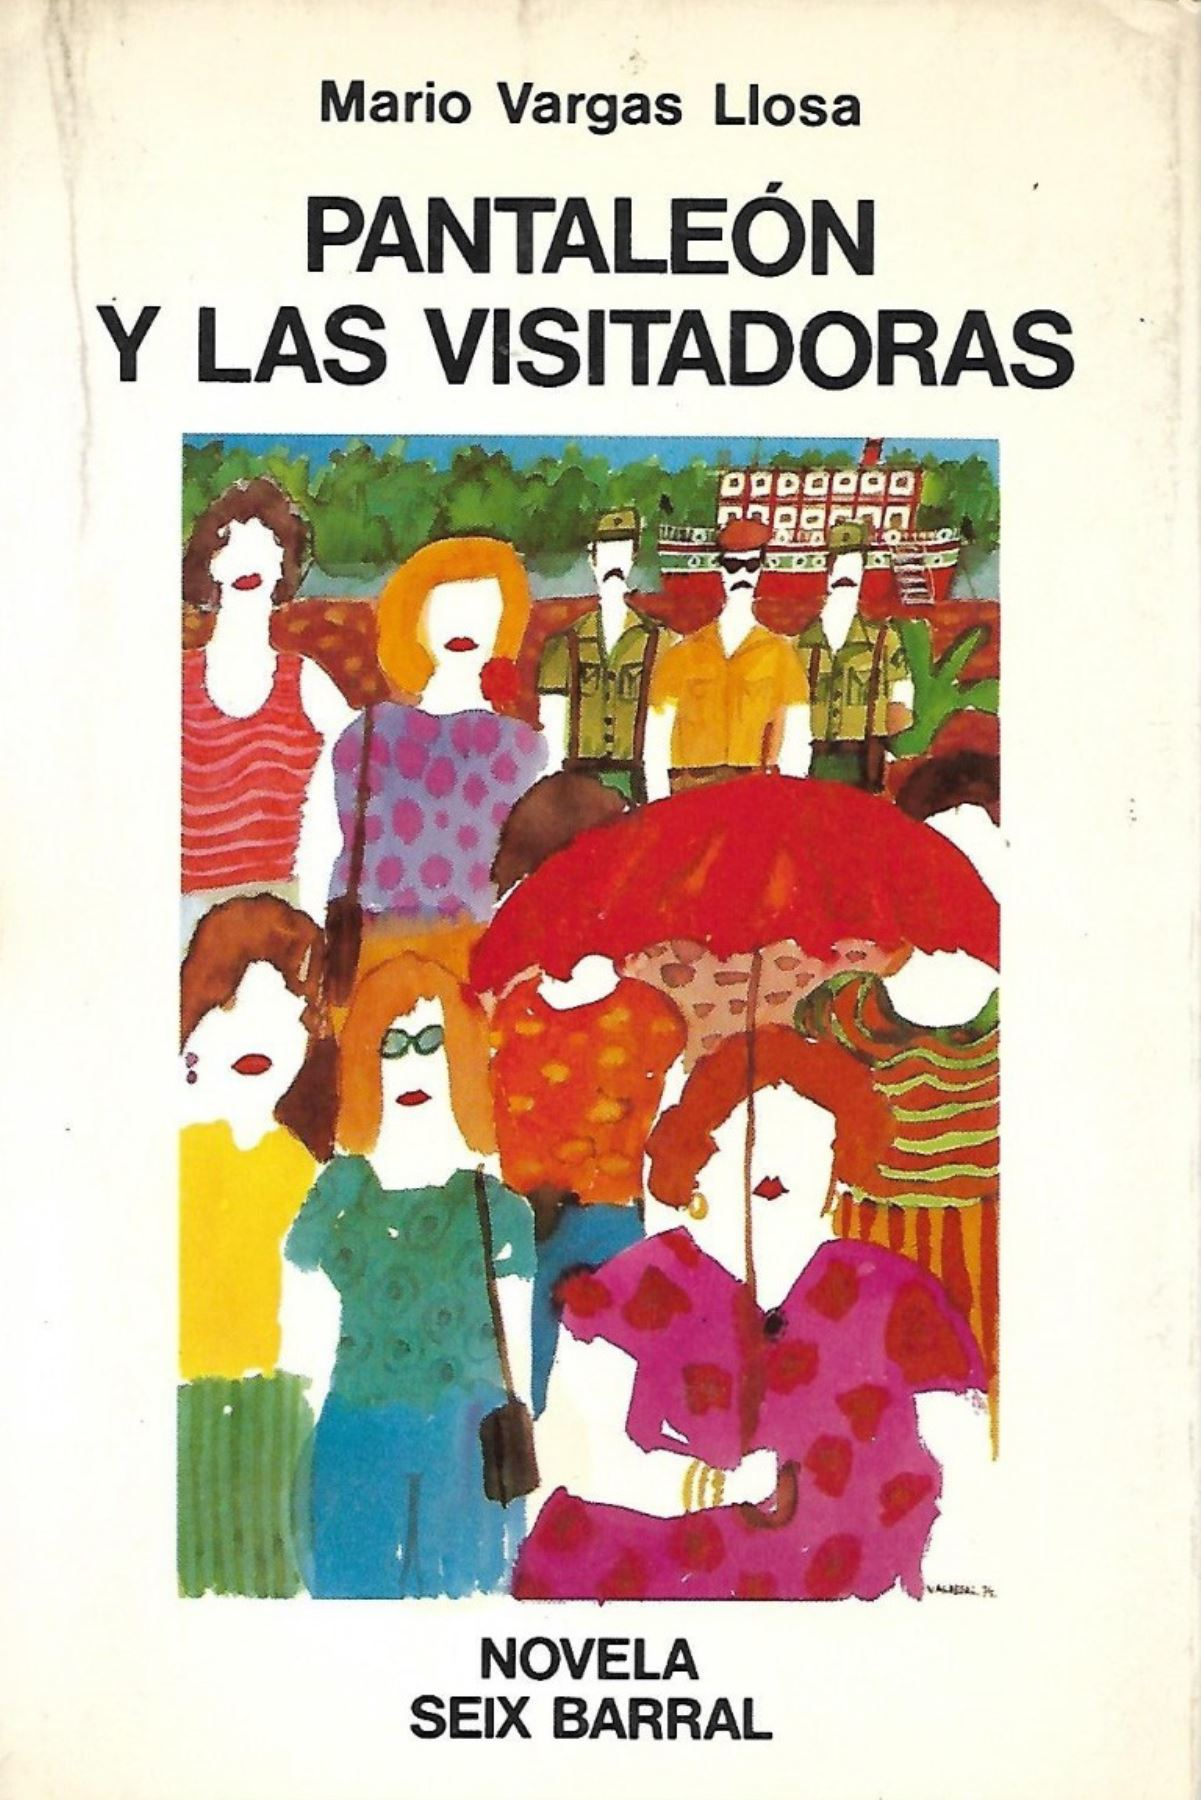 Portada de la novela Pantaleón y las visitadoras, del Premio Nobel de Literatura peruano, Mario Vargas Llosa. Enlace de foto: https://portal.andina.pe/EDPFotografia3/thumbnail/2019/03/28/000574334M.jpg